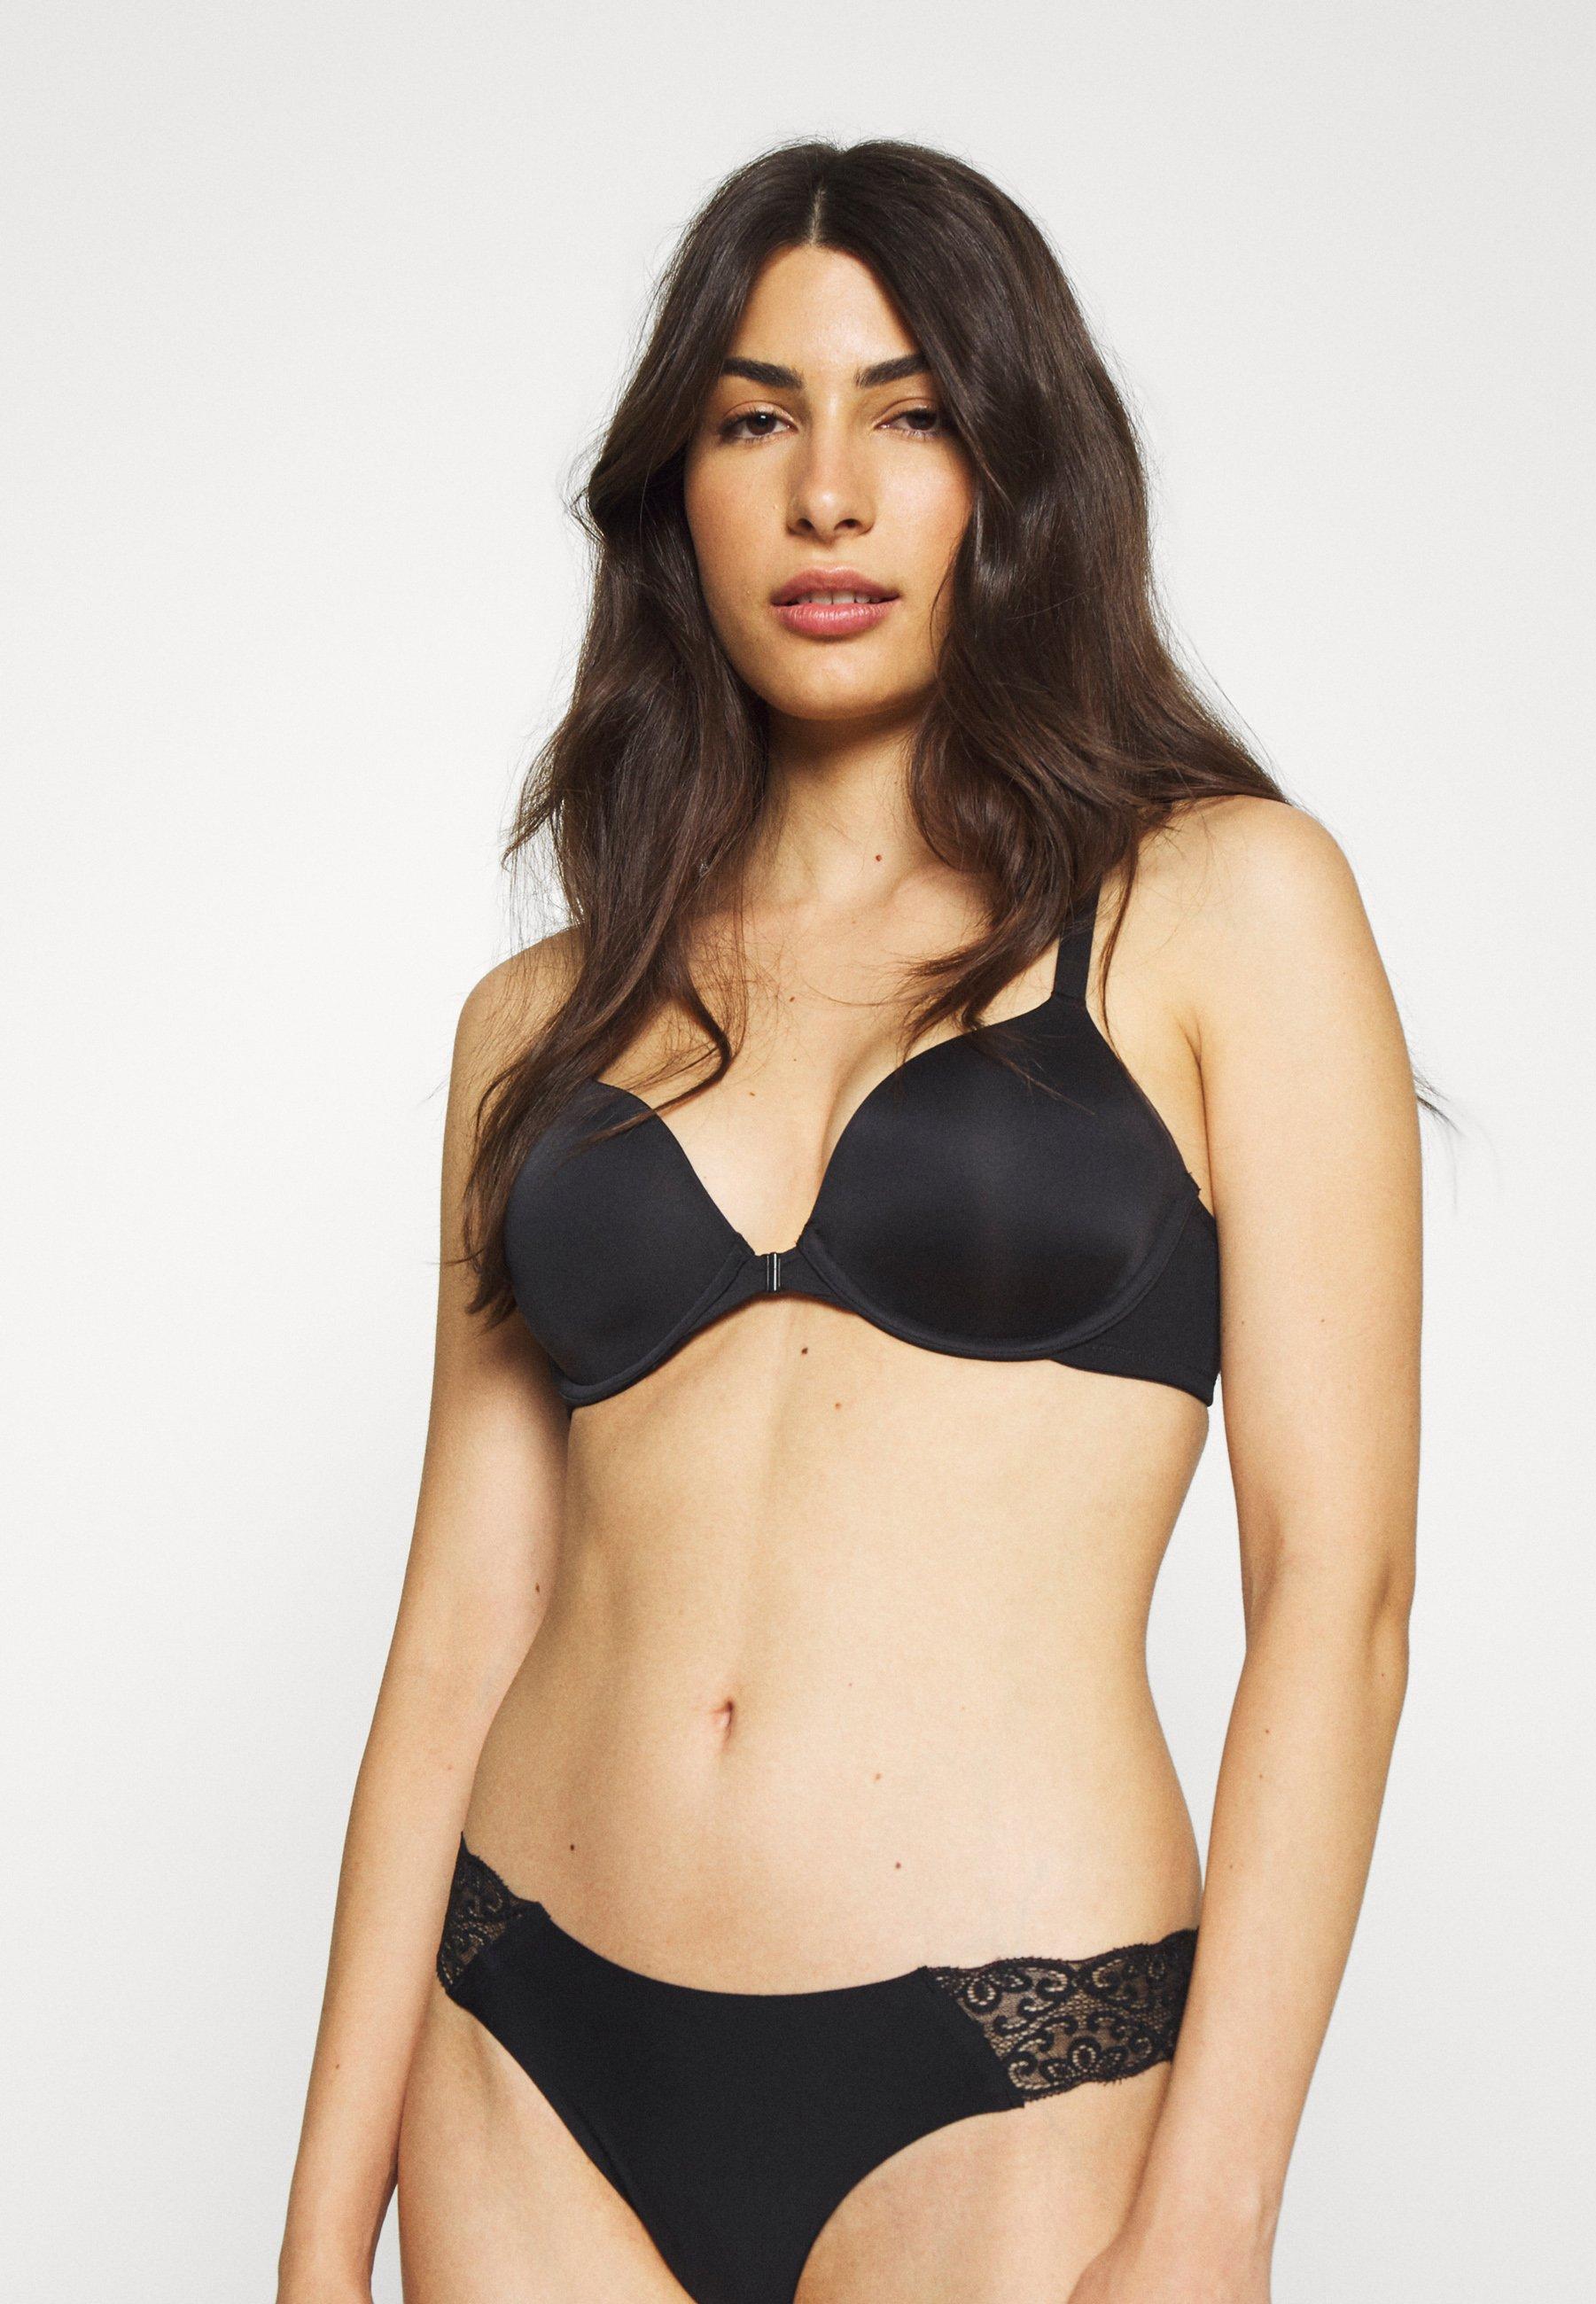 Women MODERN OPEN NECKLINE DEMI RACERBACK NO SHOW BRA FRONT  - T-shirt bra